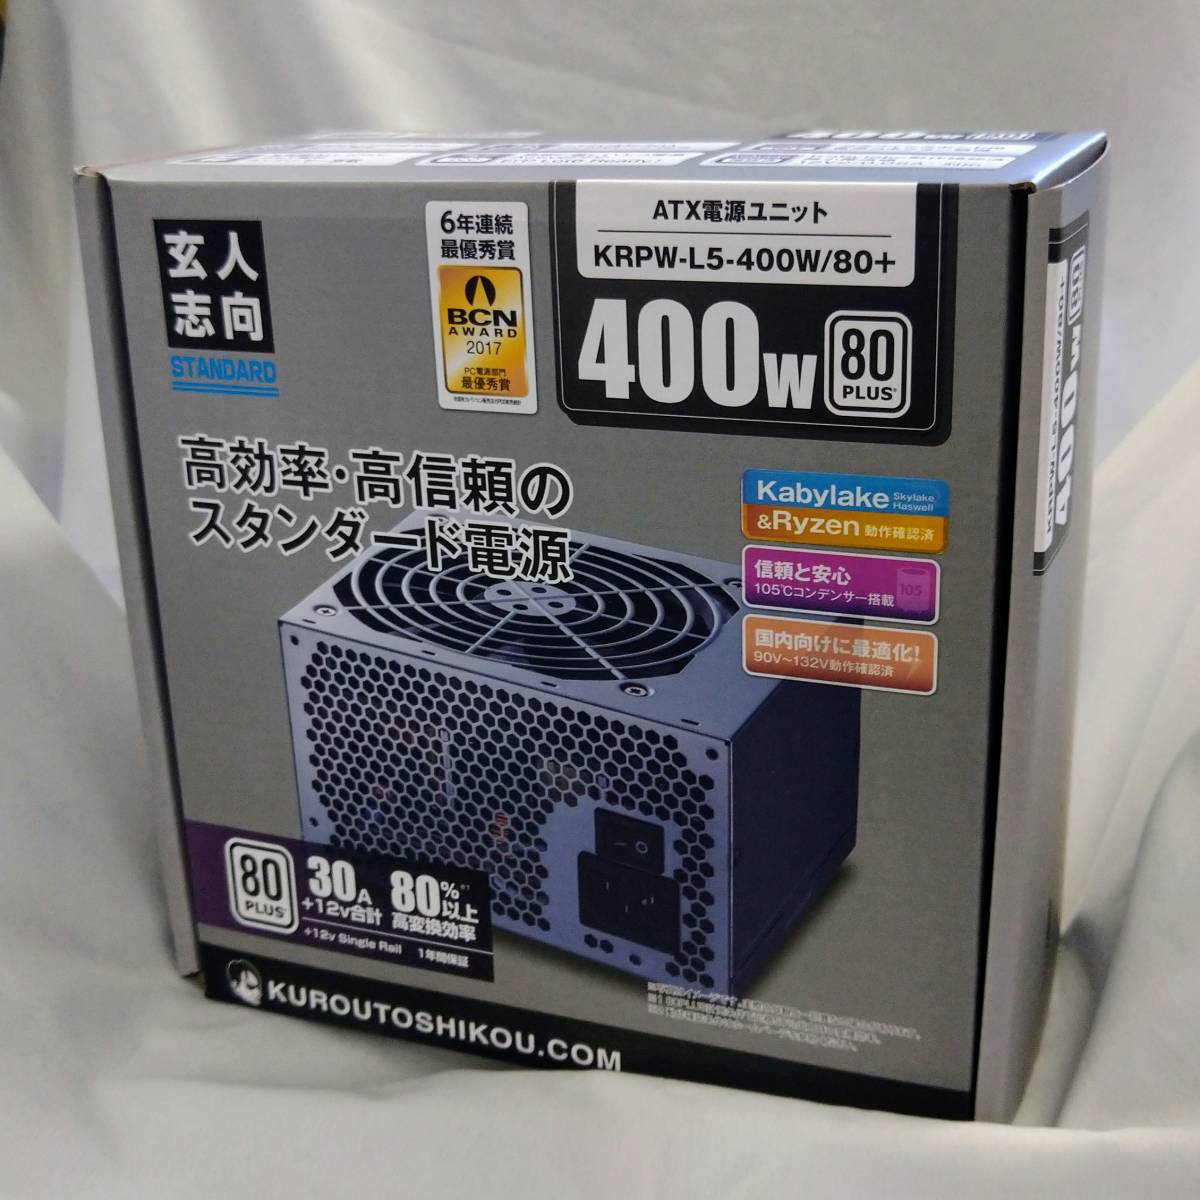 新品未使用 玄人志向 STANDARDシリーズ 80 PLUS 400W ATX電源 KRPW-L5-400W/80 電源ケーブル付属  C20009_画像1